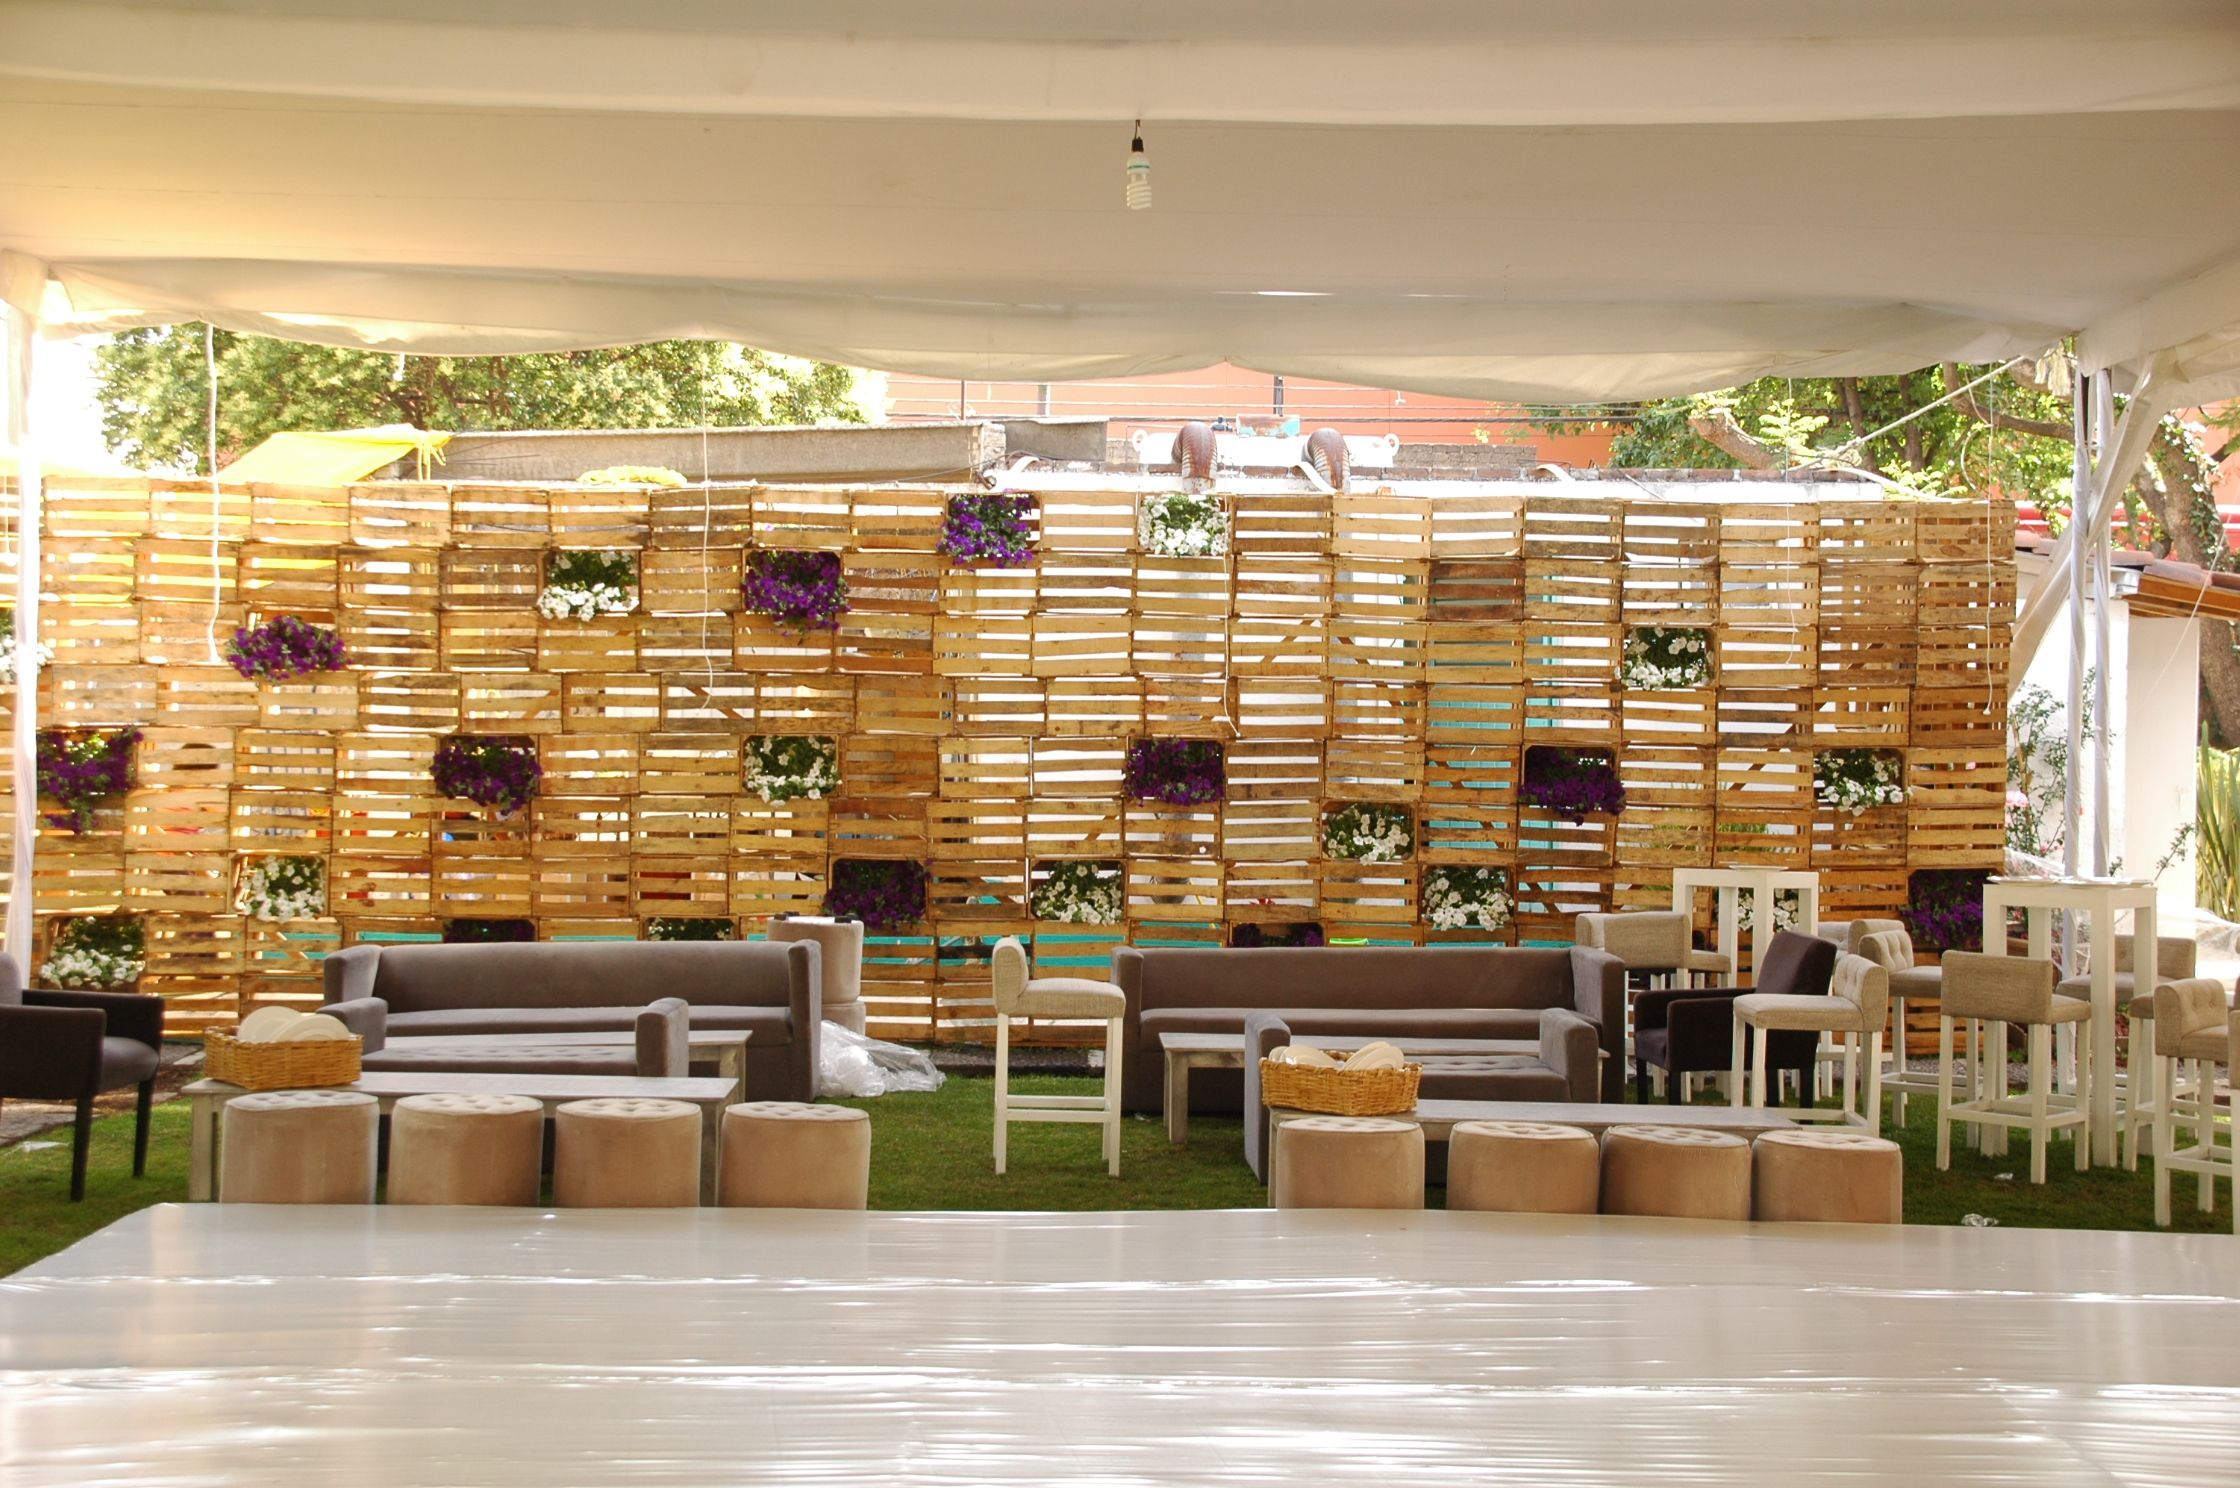 Celos a de huacales de madera jard n vertical pinterest for Celosia de madera para jardin